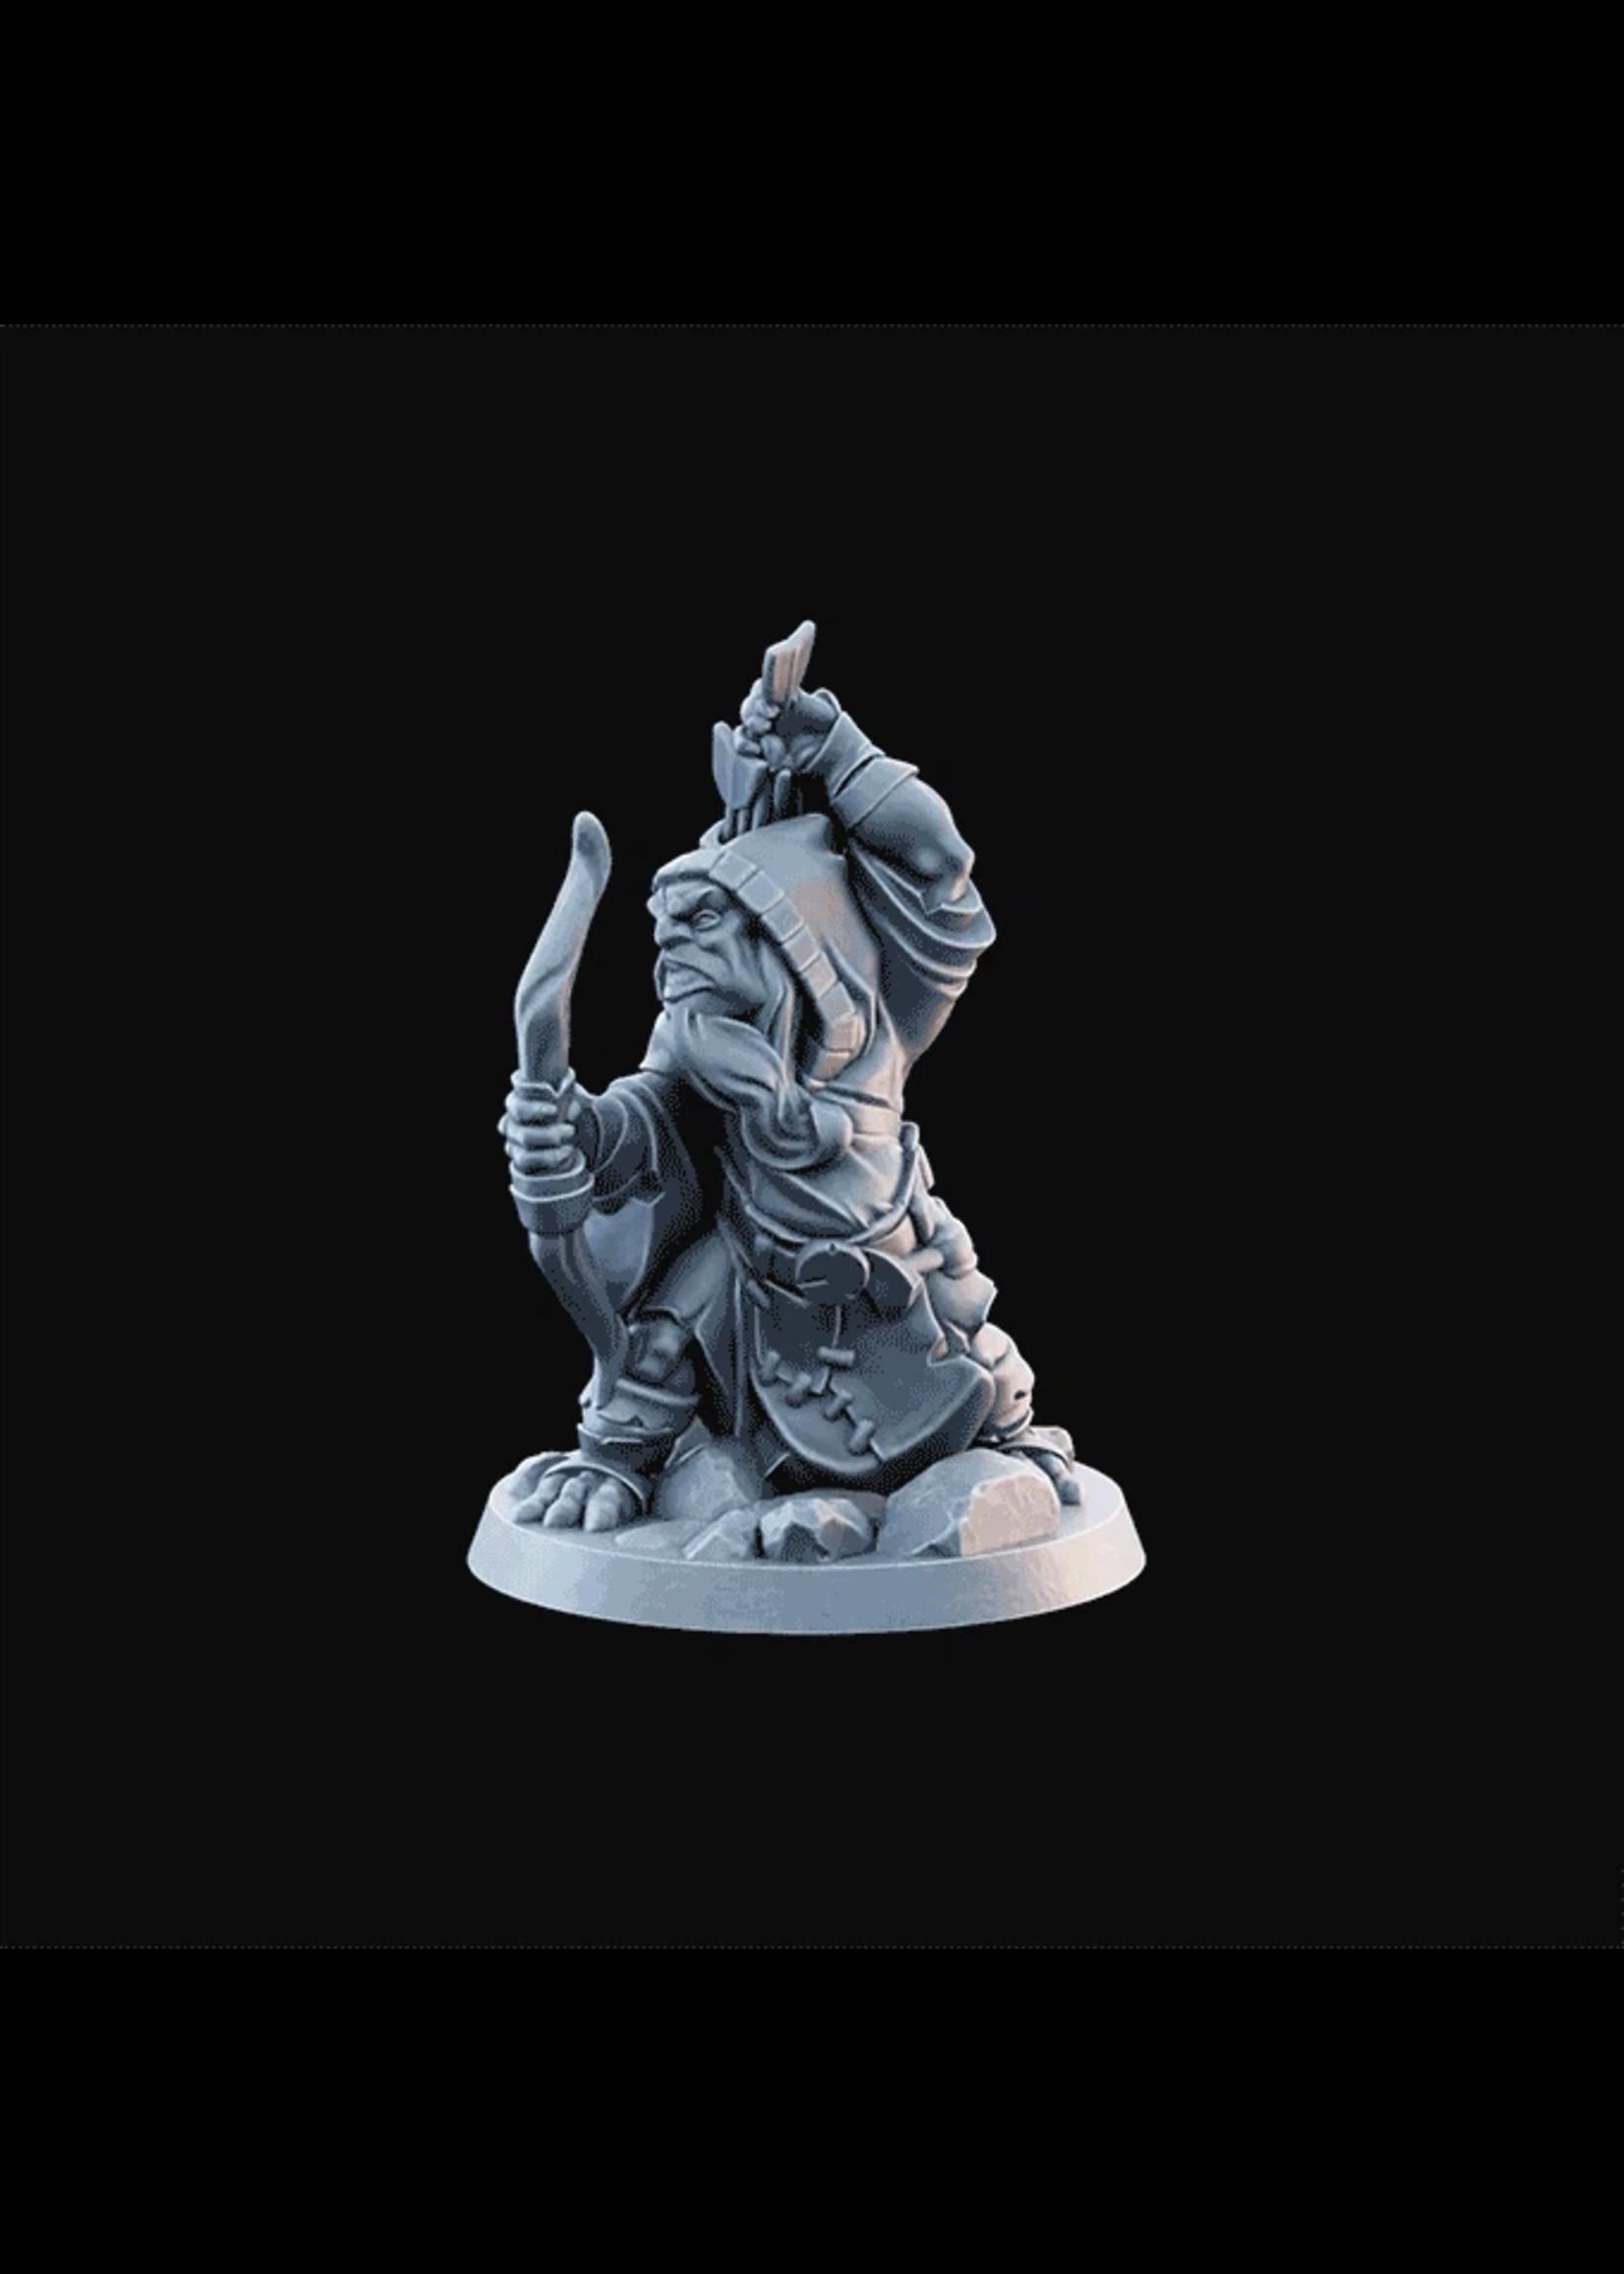 3D Printed Miniature - Goblin03  - Dungeons & Dragons - Desolate Plains KS